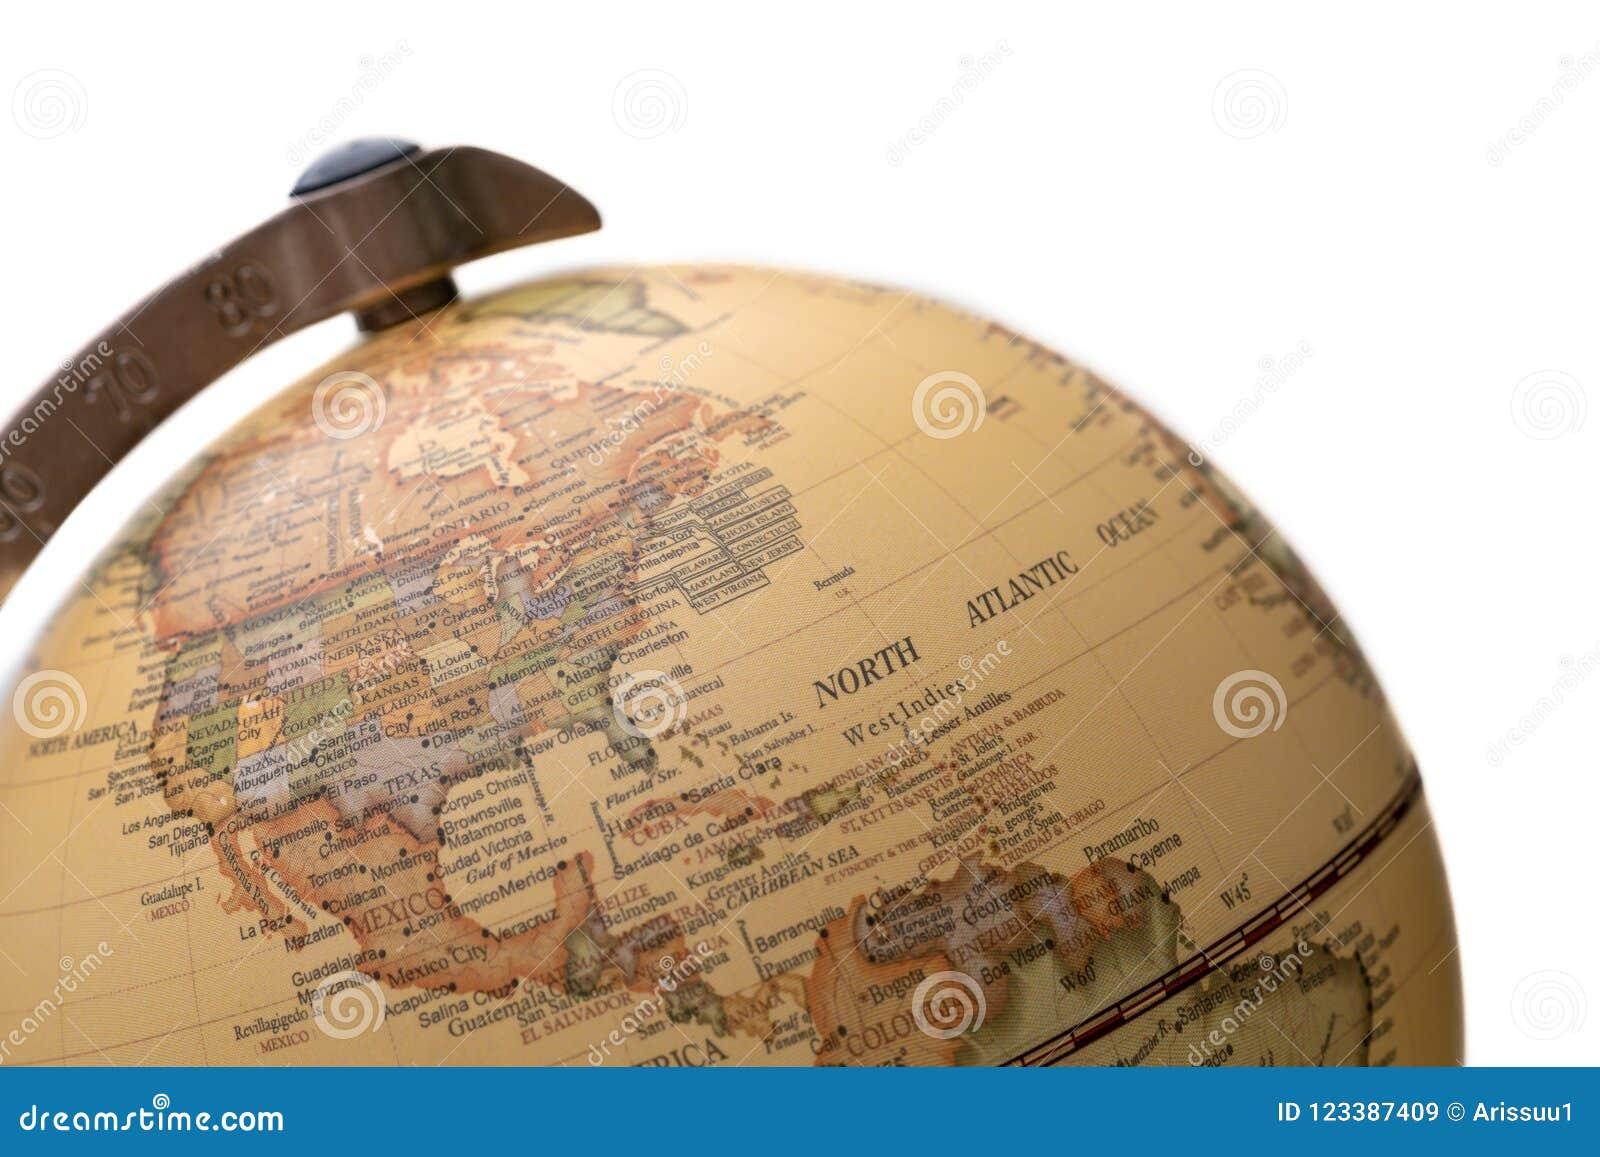 Spherical World Map.World Globe Orb Spherical Model Stock Image Image Of Country Blue